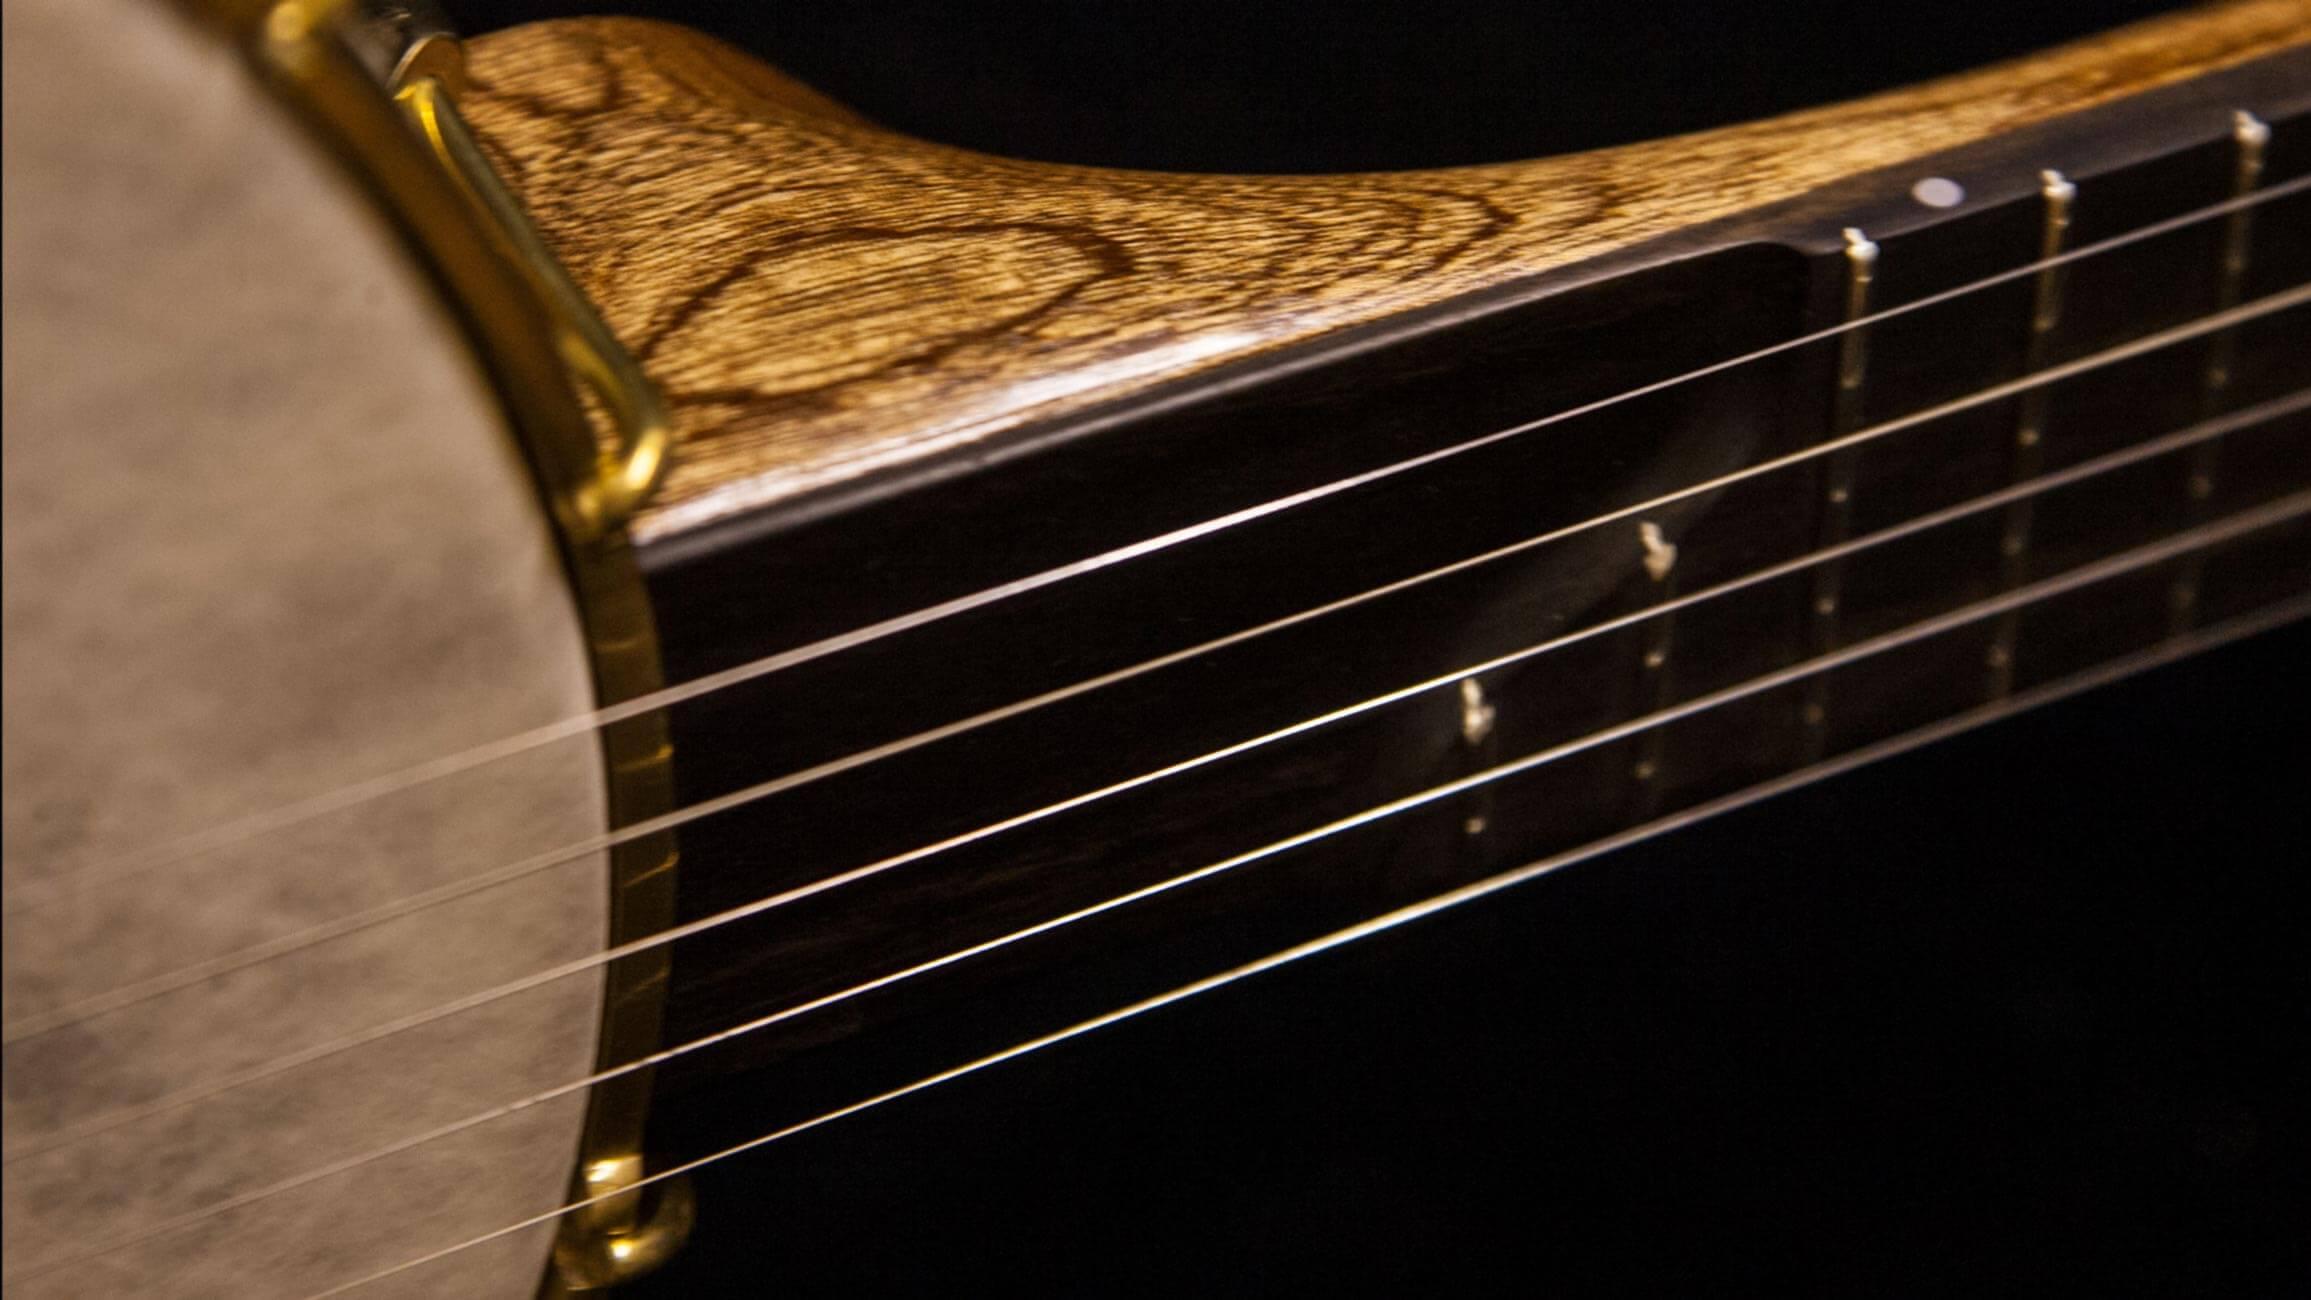 11-inch-rim-sapele-rosewood-banjo neck